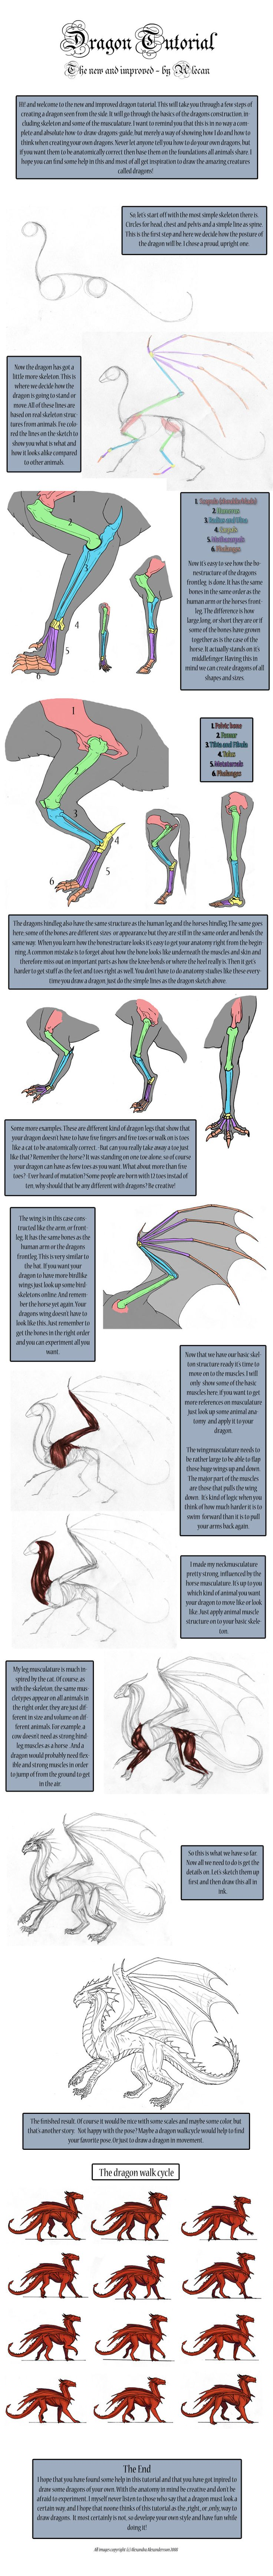 Dragon Tutorial - New by *alecan on deviantART